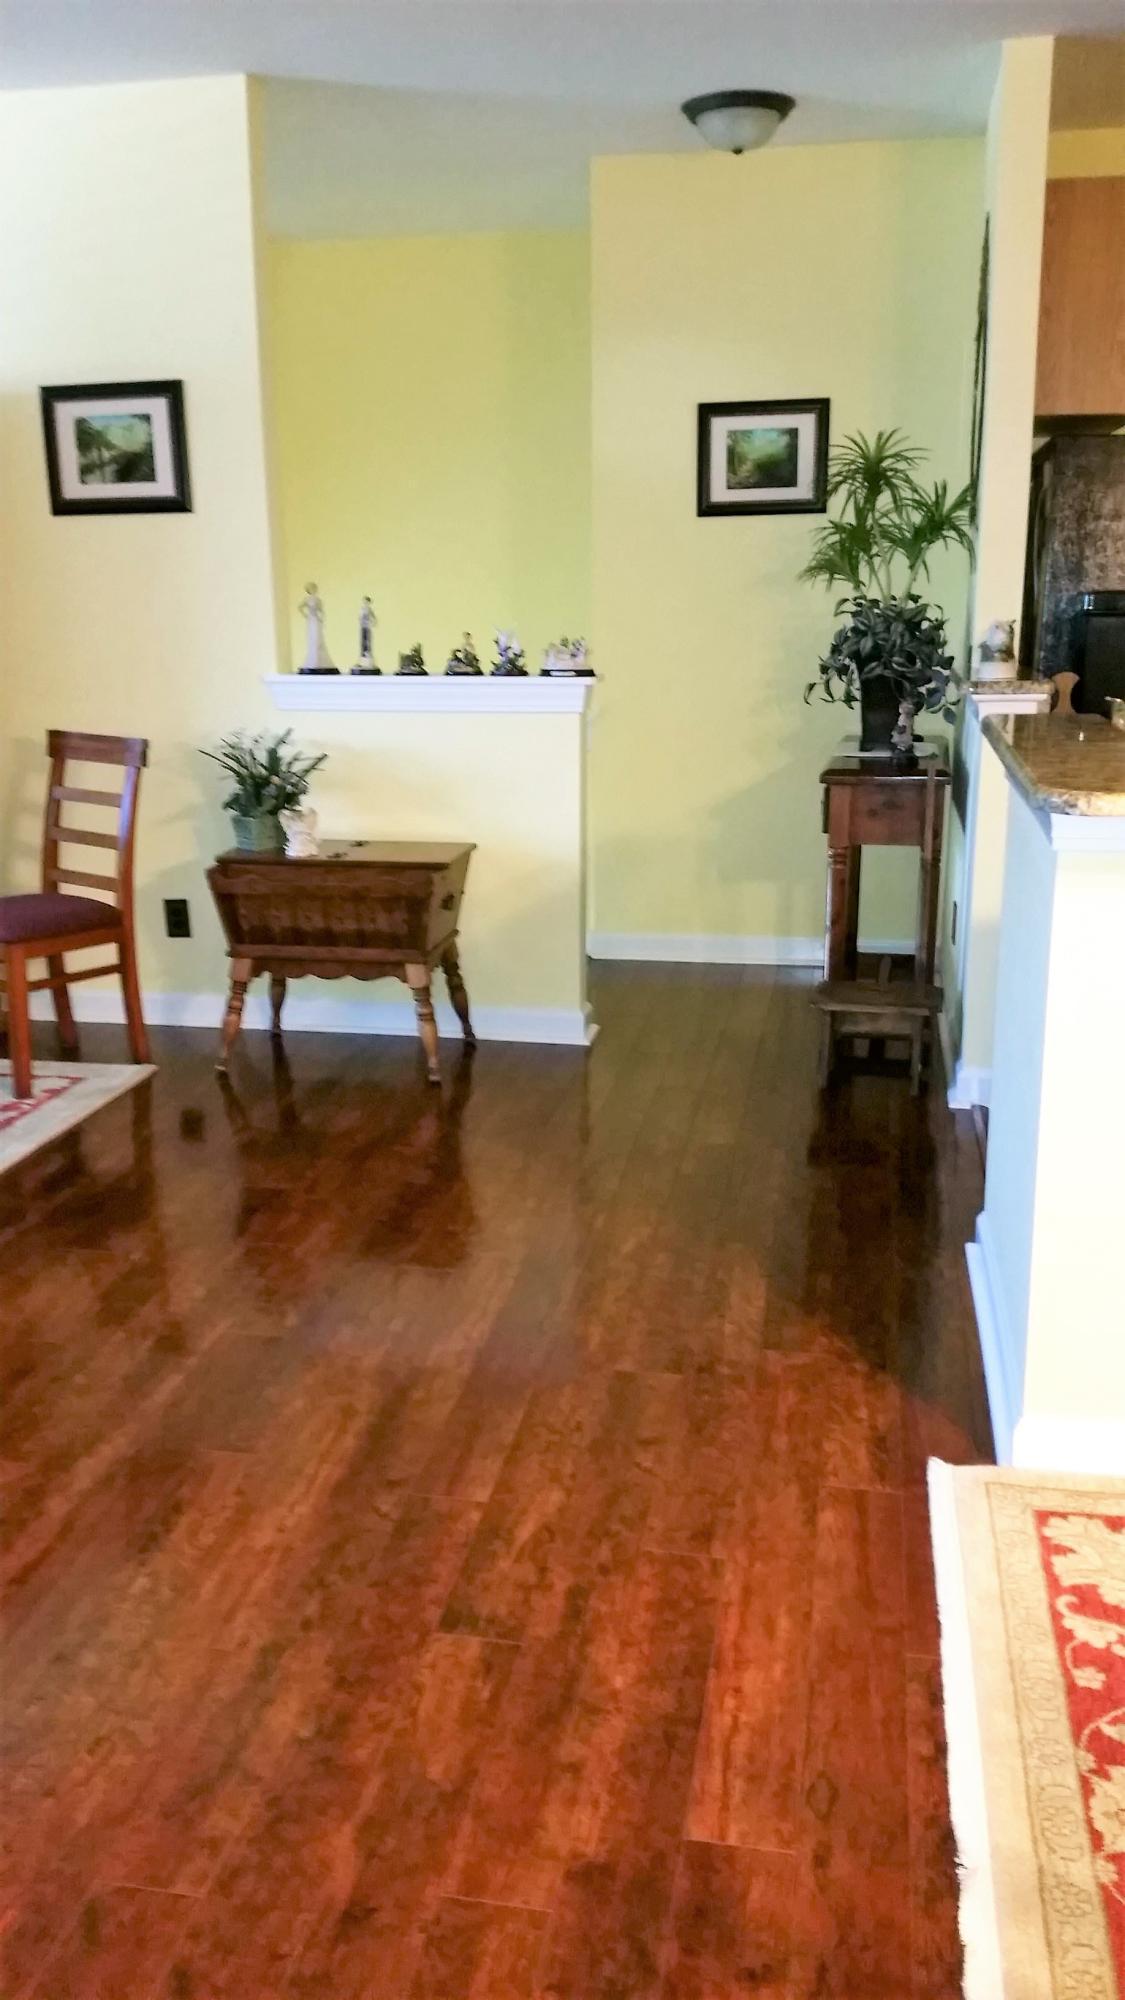 Dunes West Homes For Sale - 1362 Kingsford, Mount Pleasant, SC - 9